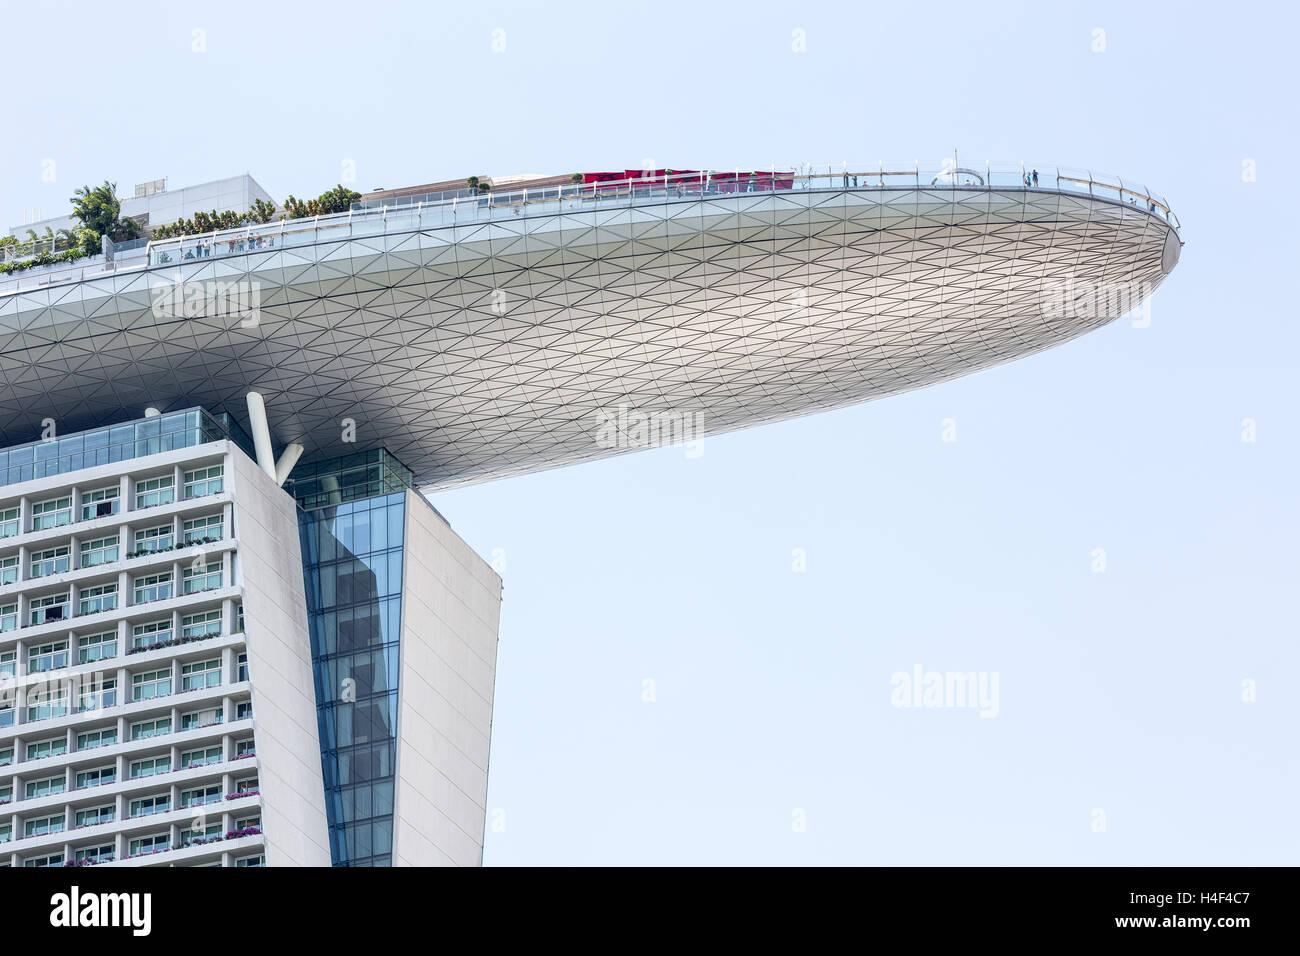 Marina Bay Sands hotel in Singapore - Stock Image